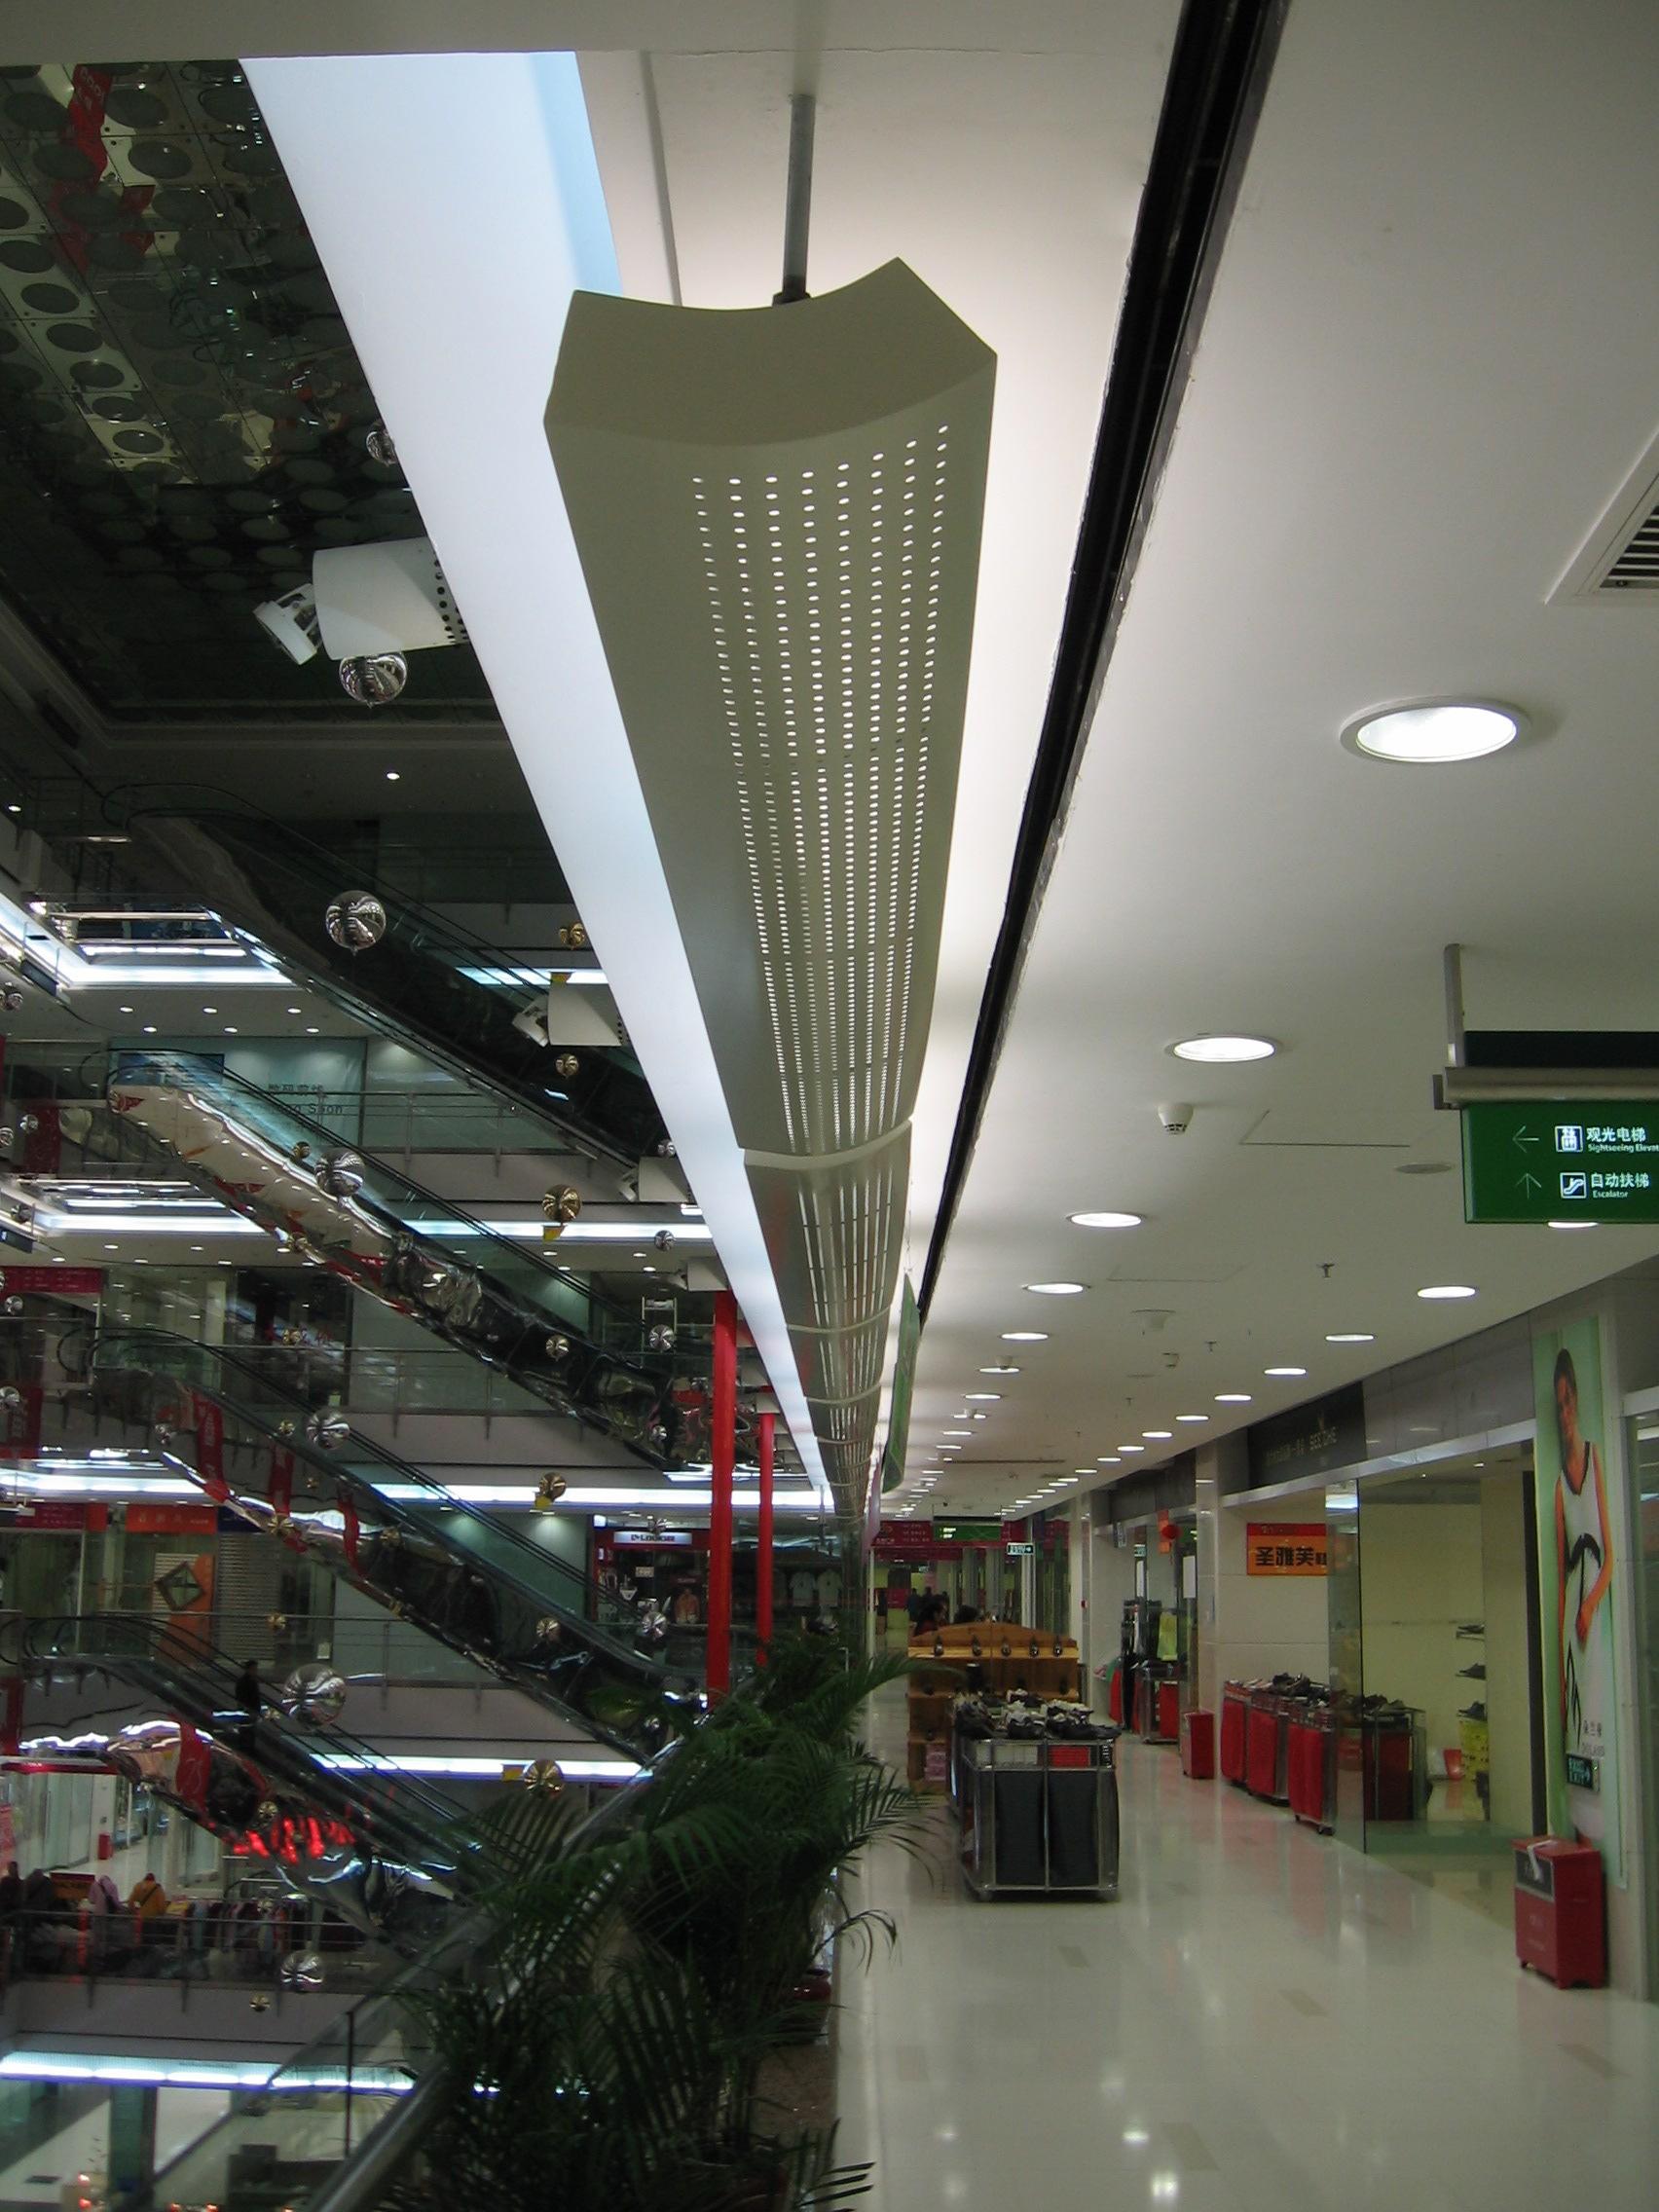 Guangzhou Guangming Square Ceiling Project